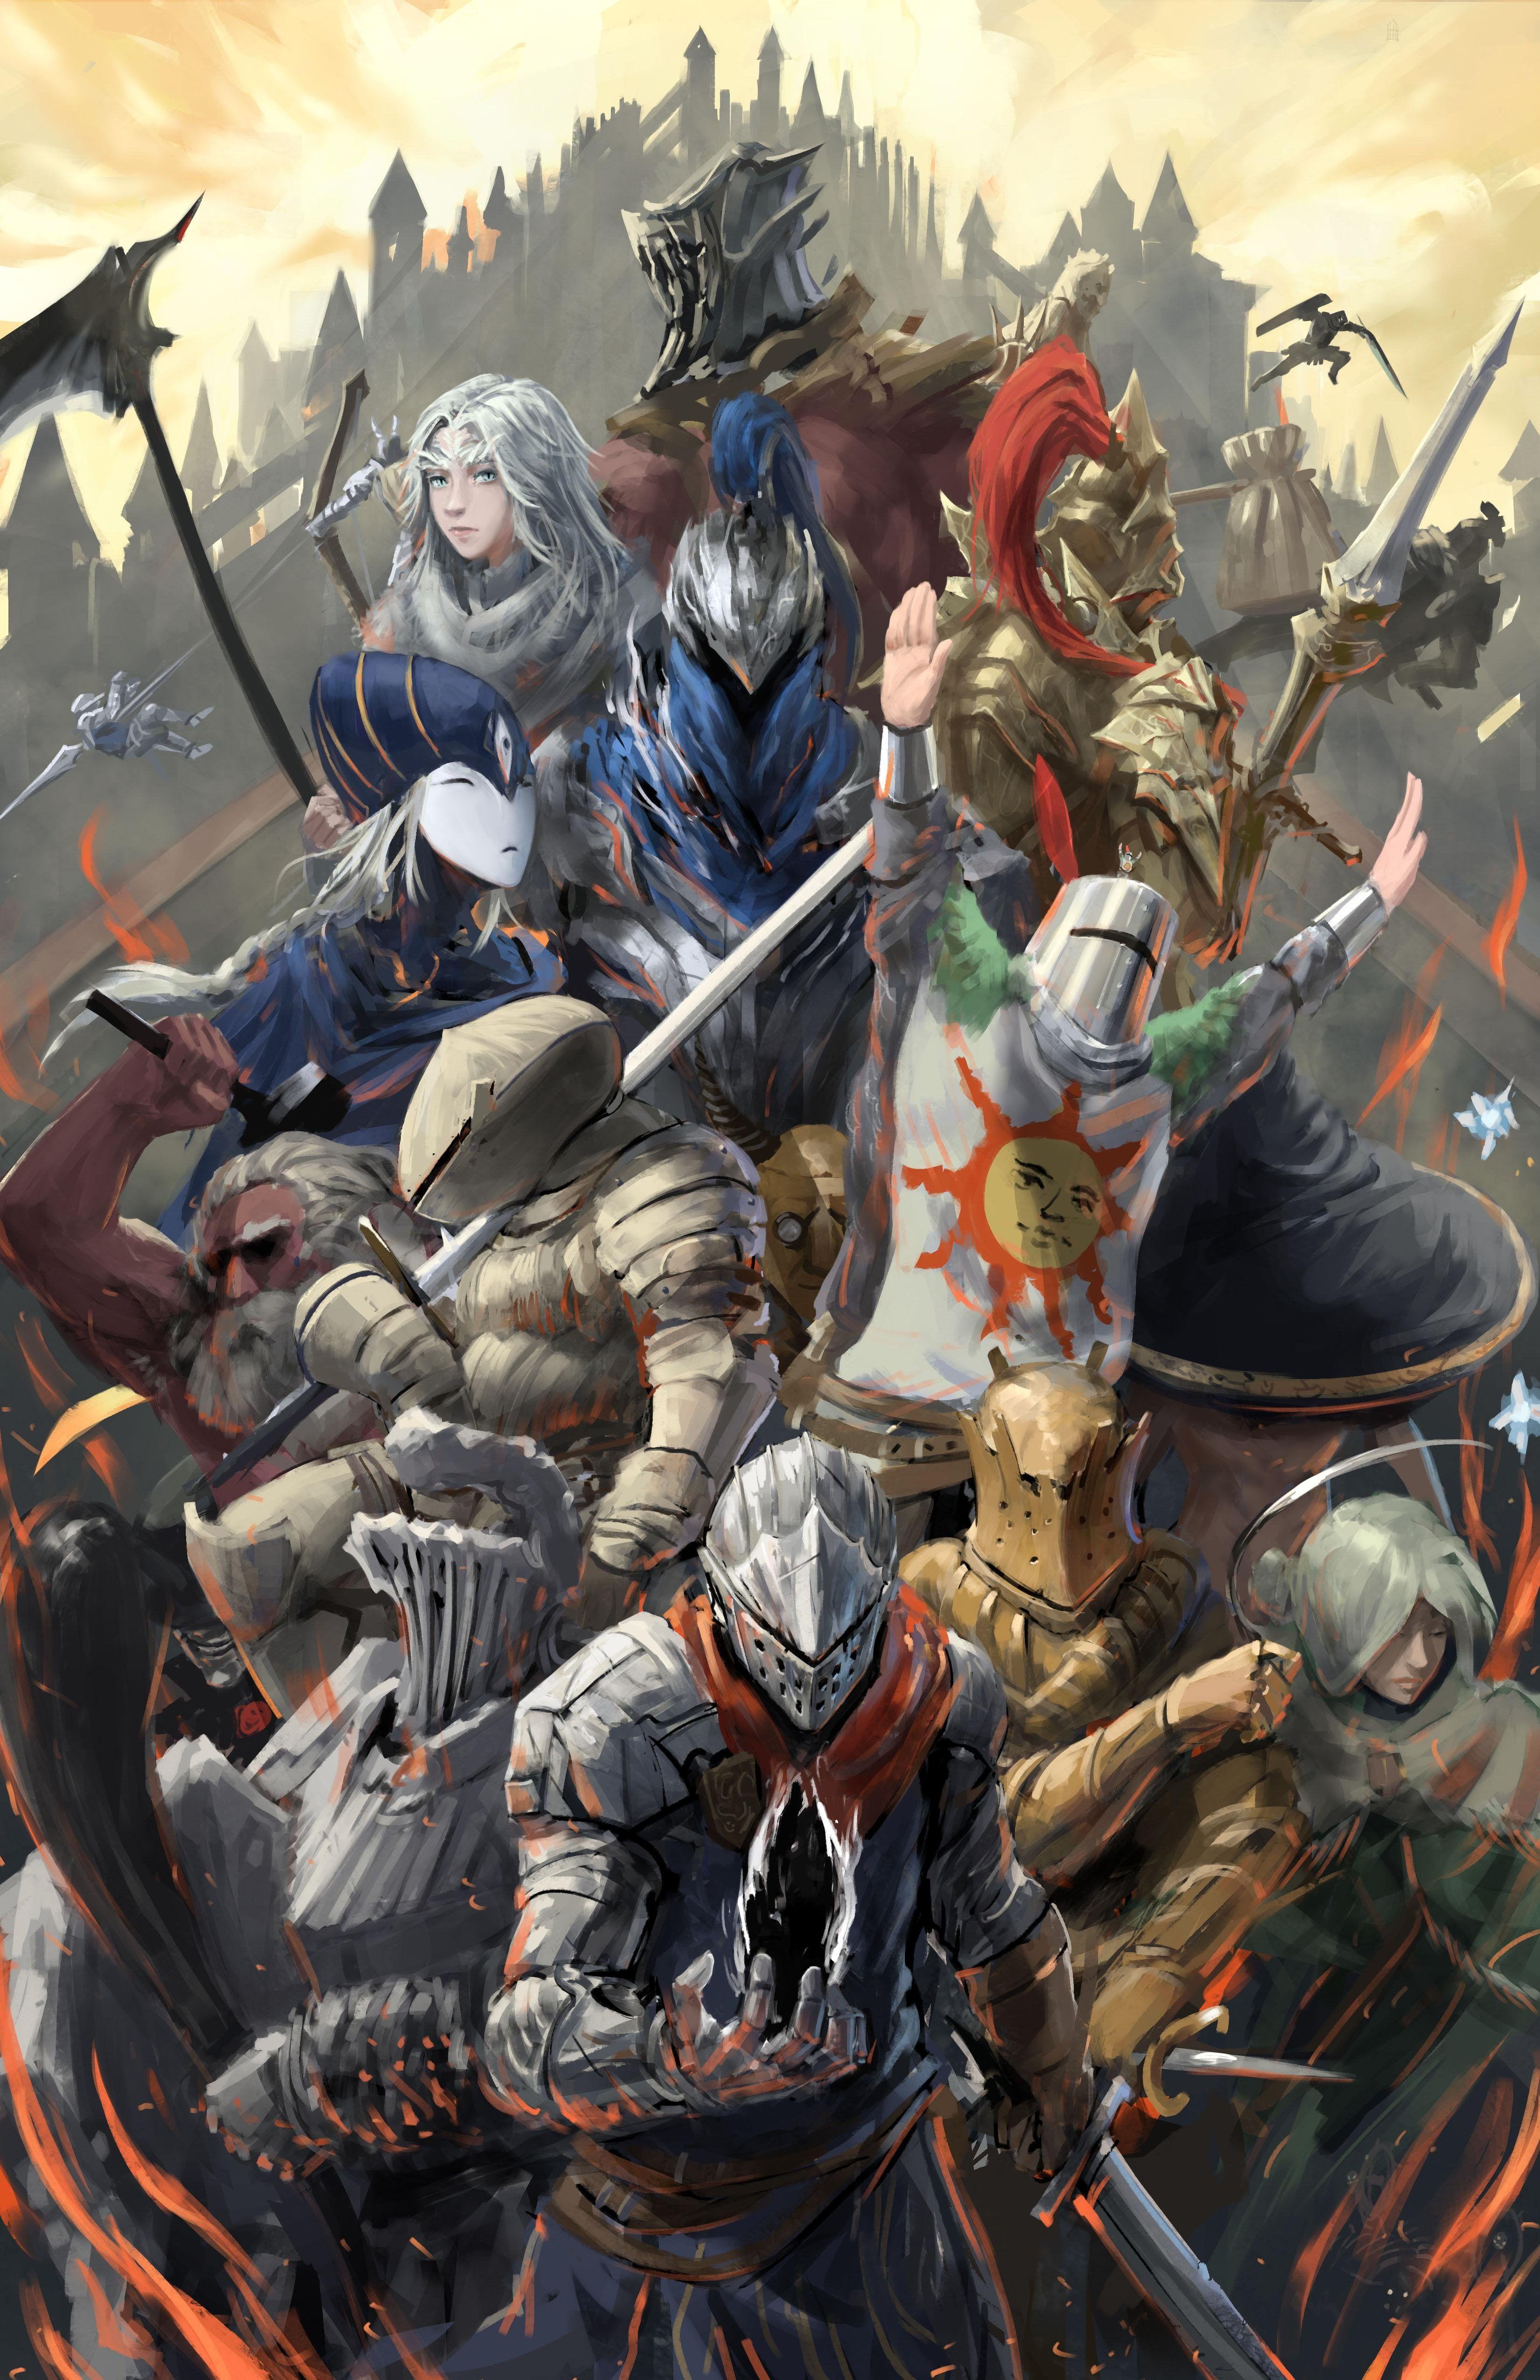 Dark Souls Wallpaper Arte Dark Souls Arte De Jogos Dark Souls